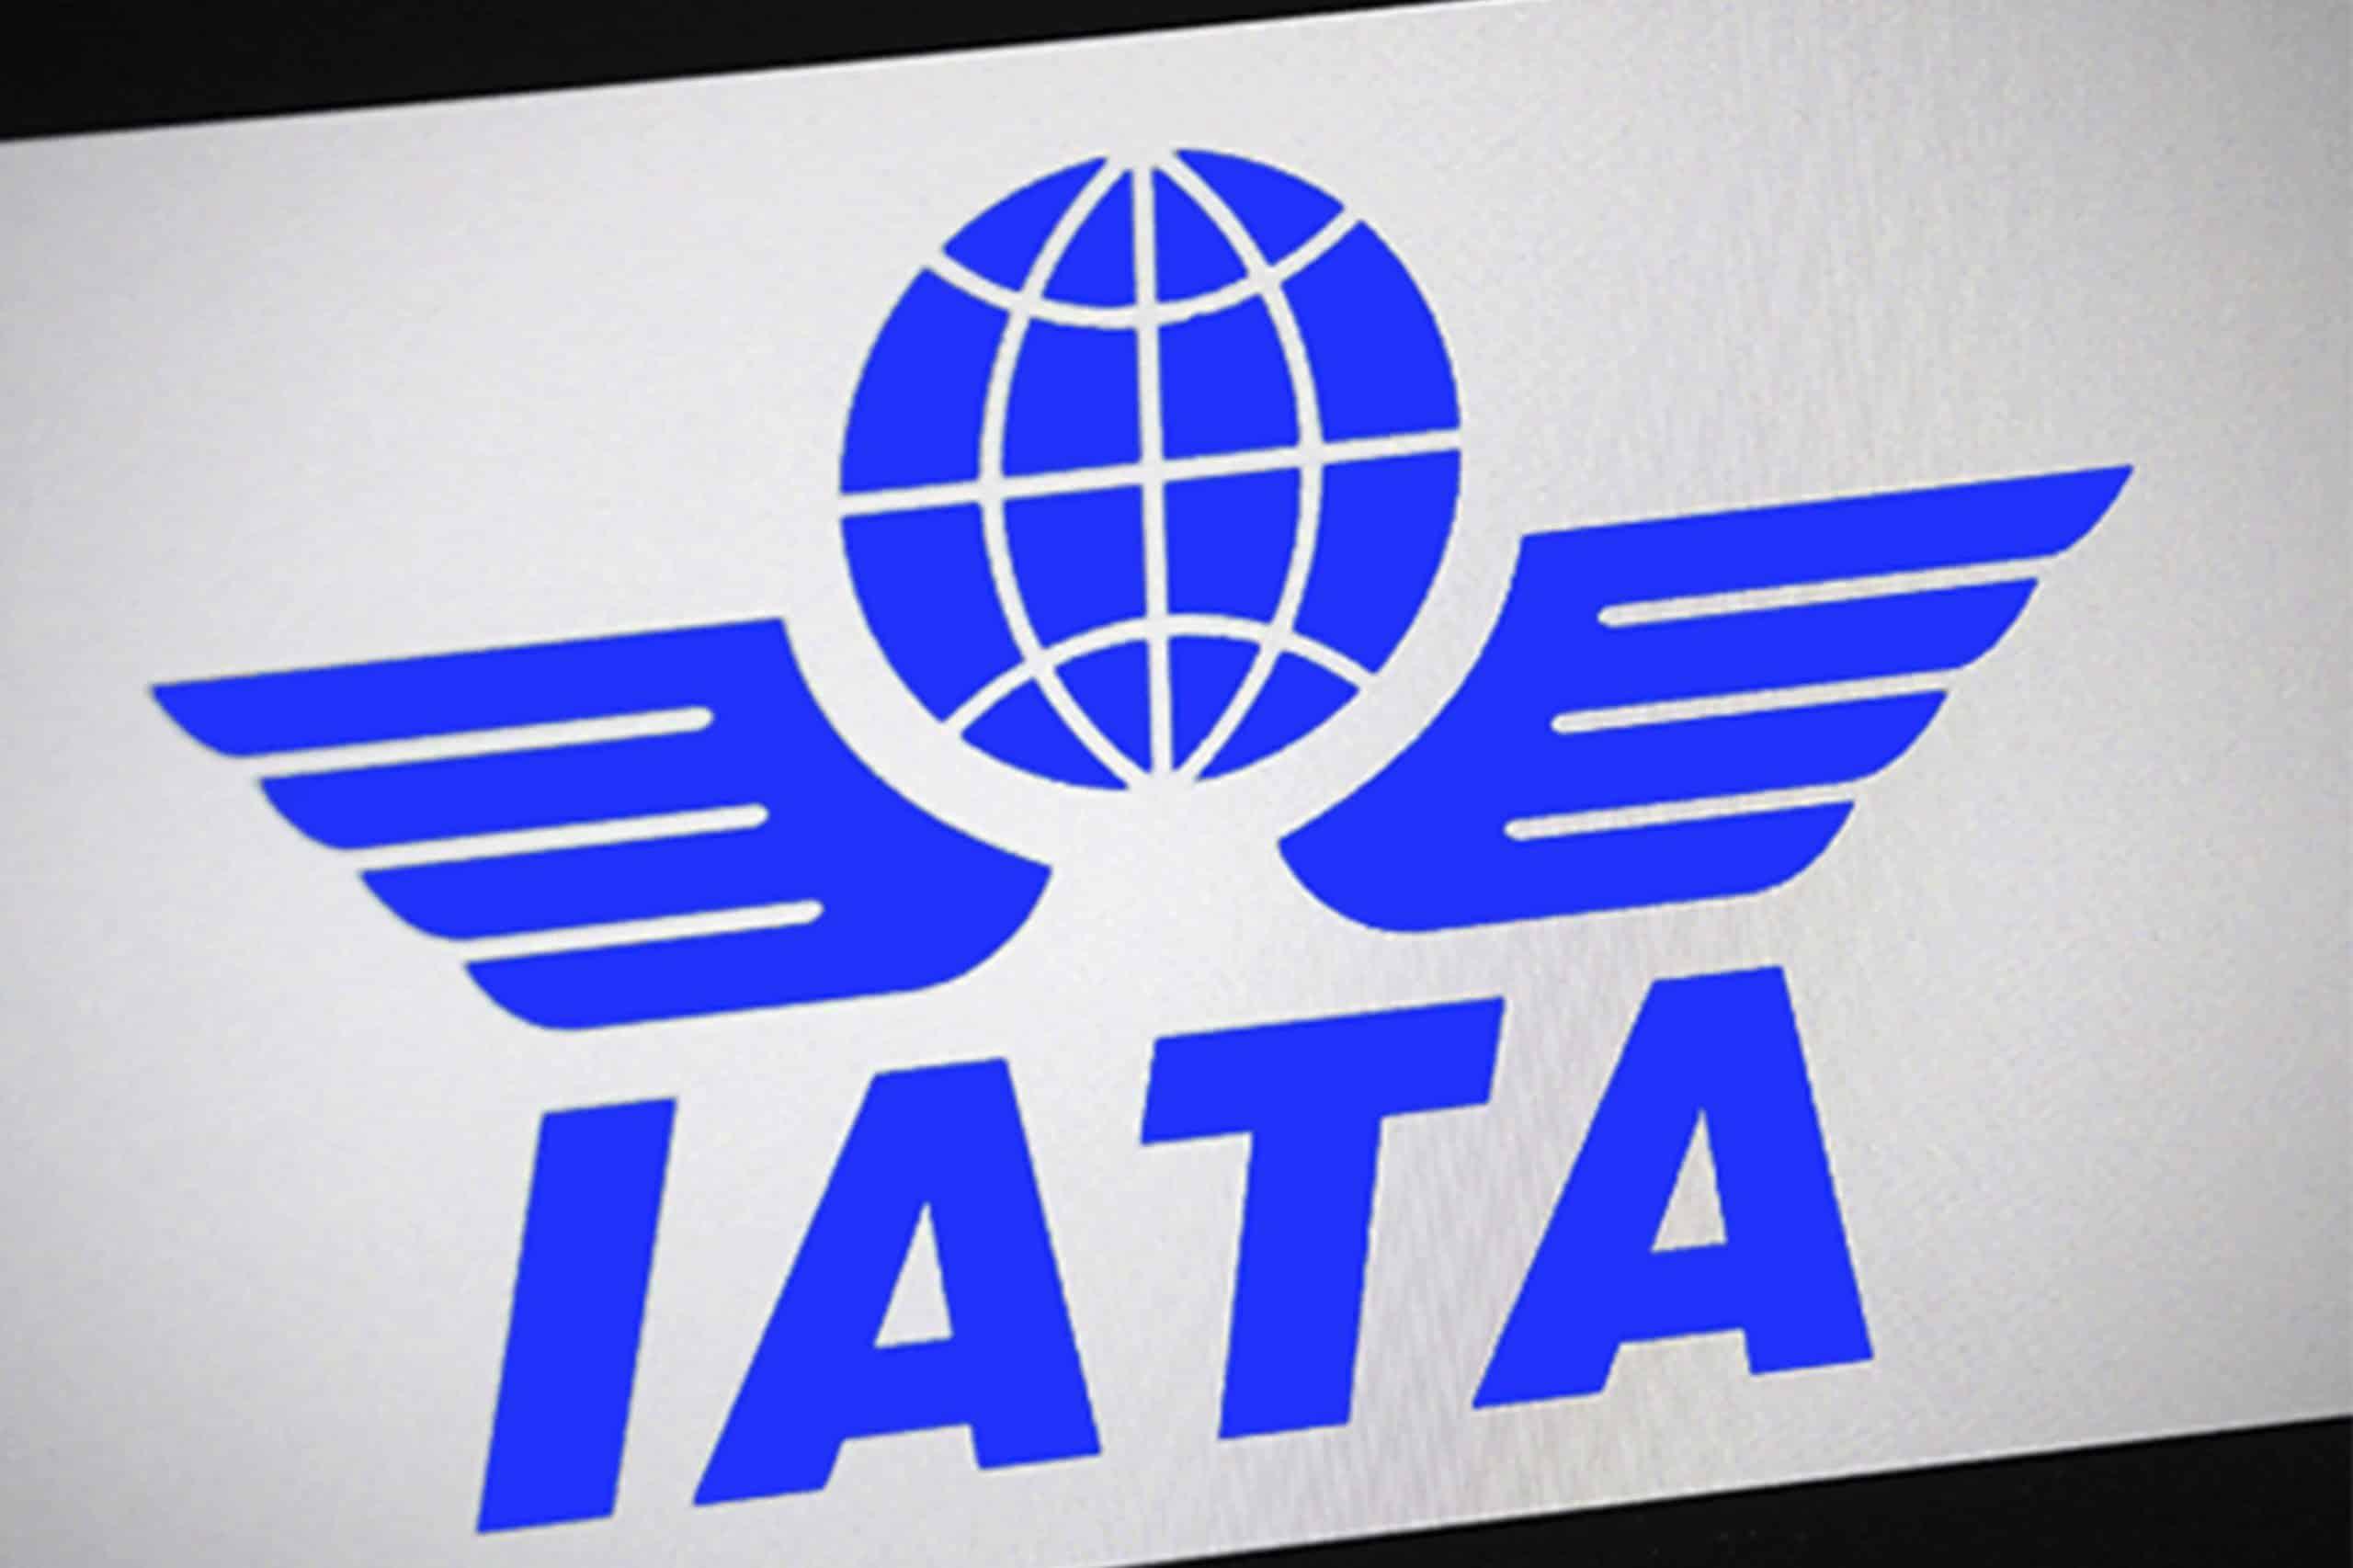 IATA-image